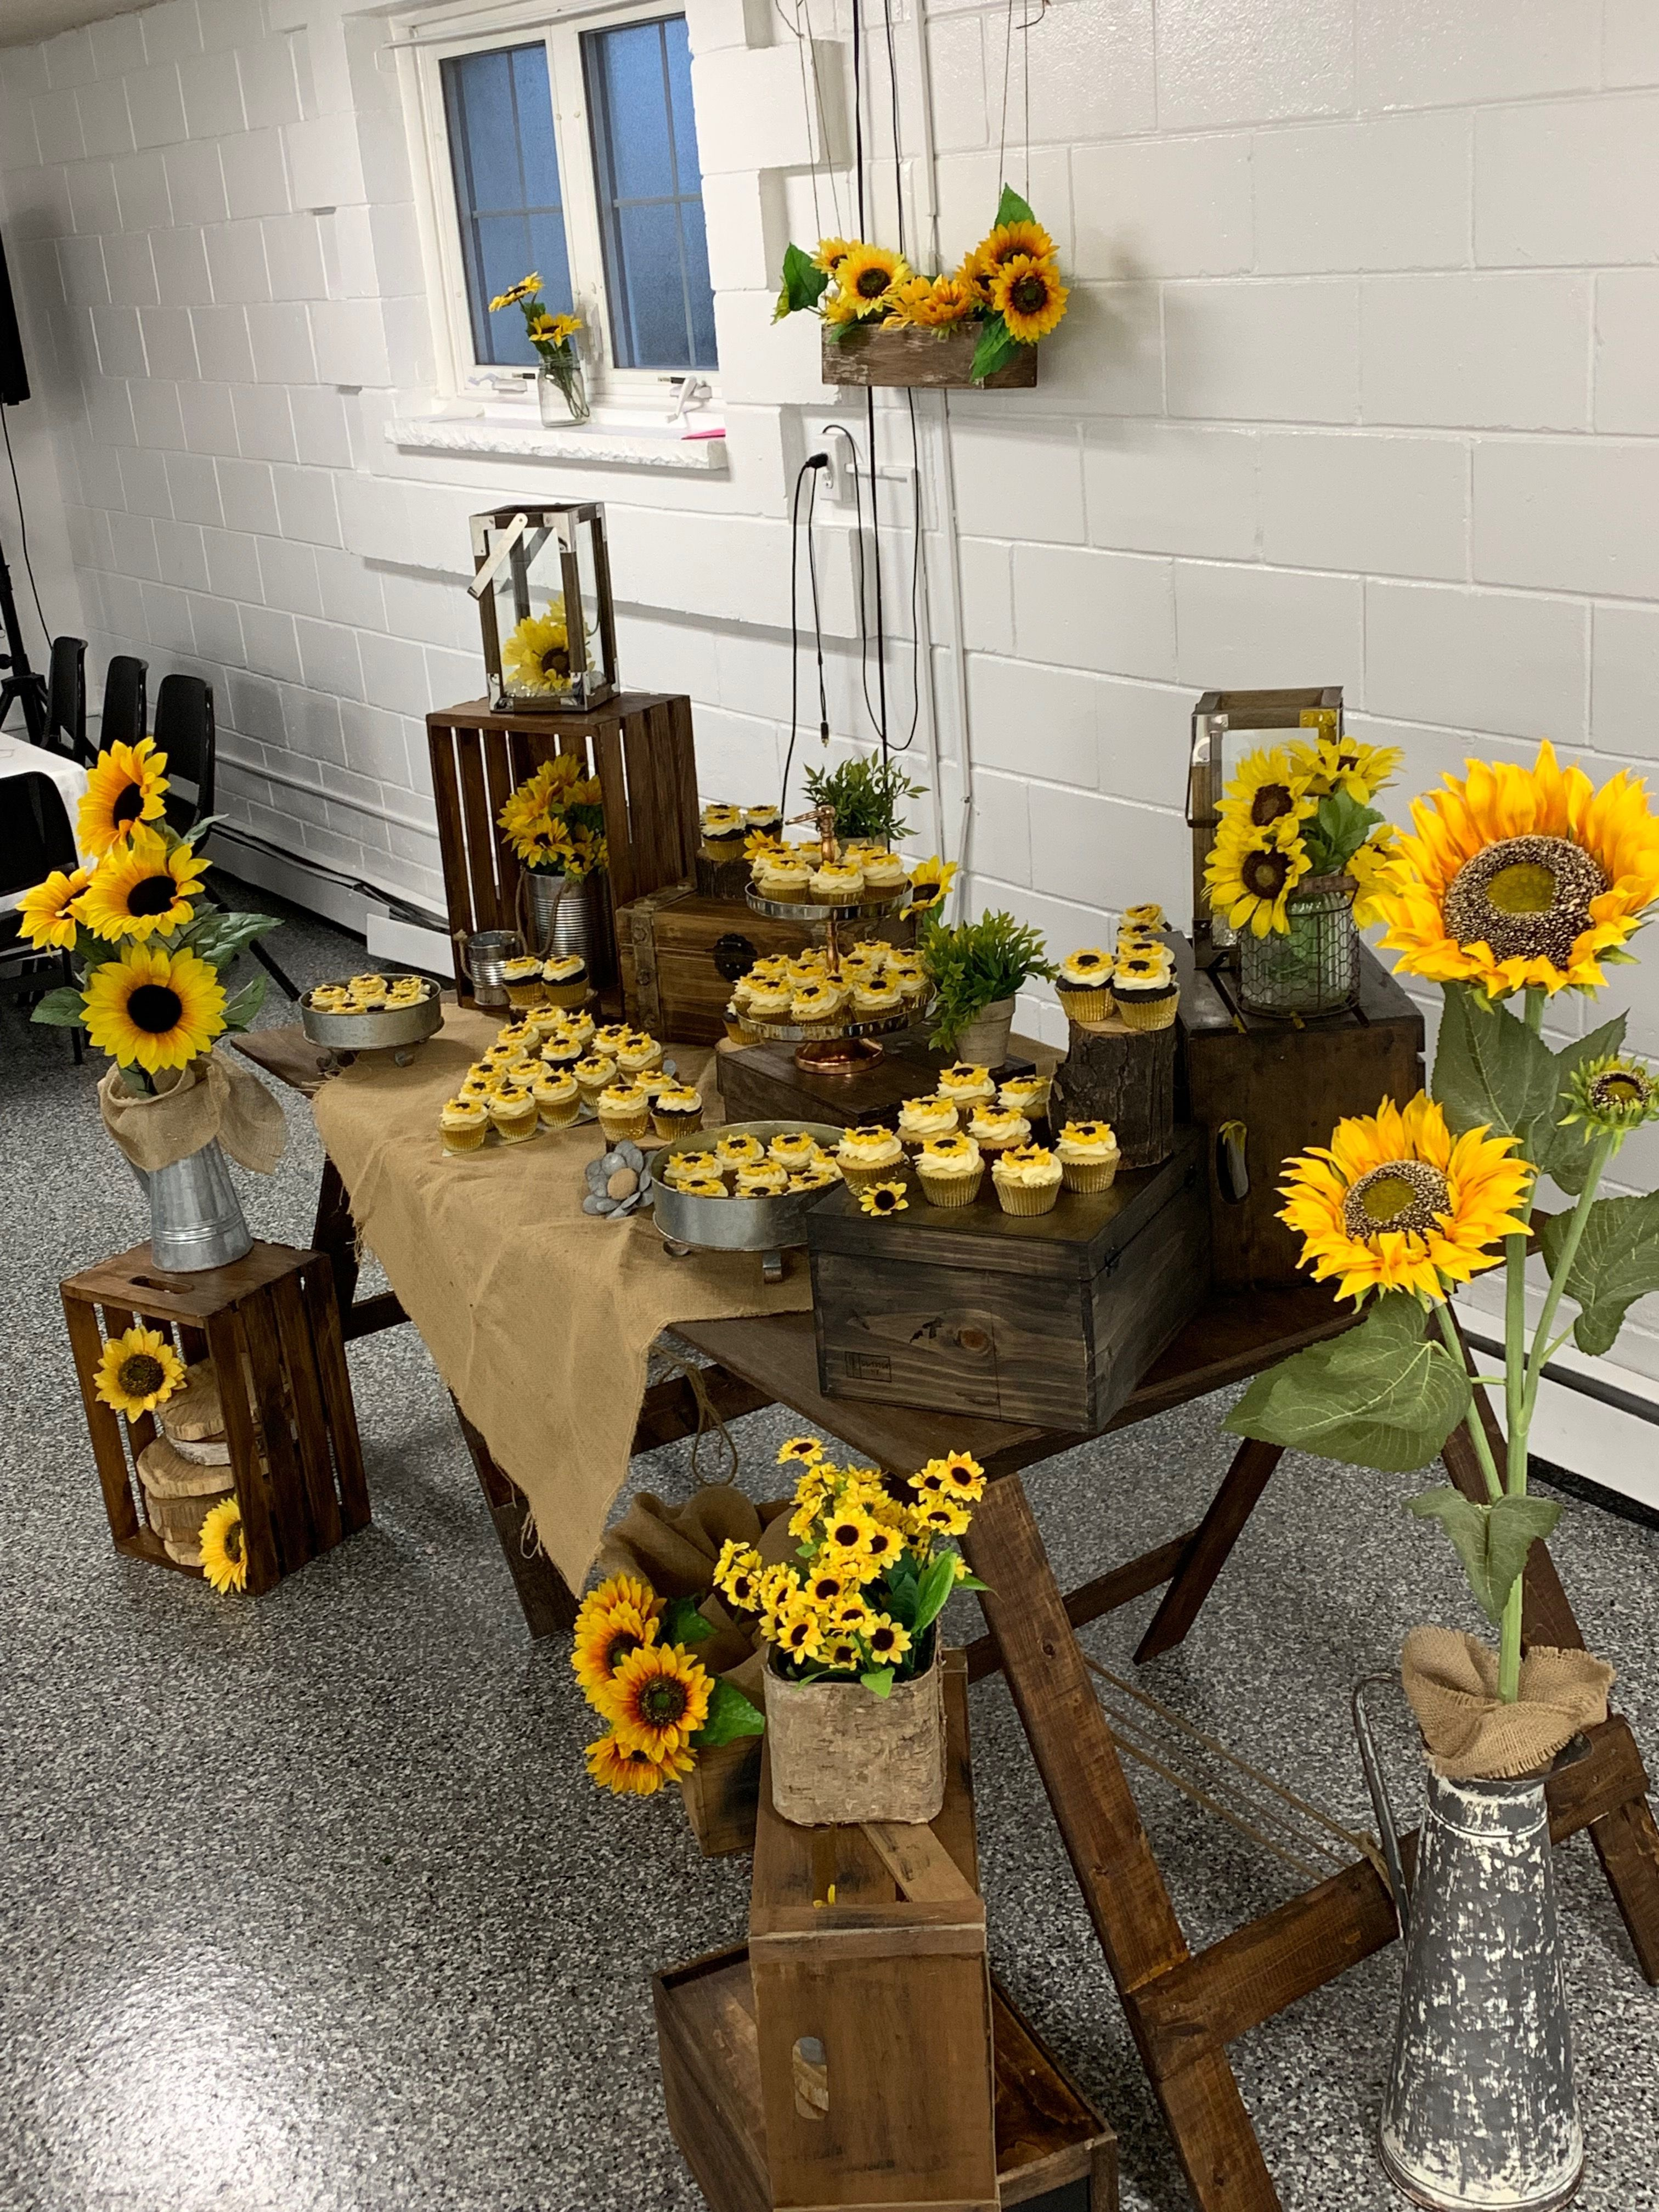 Best 12 With bees & sunflowers - SkillOfKing.Com ...